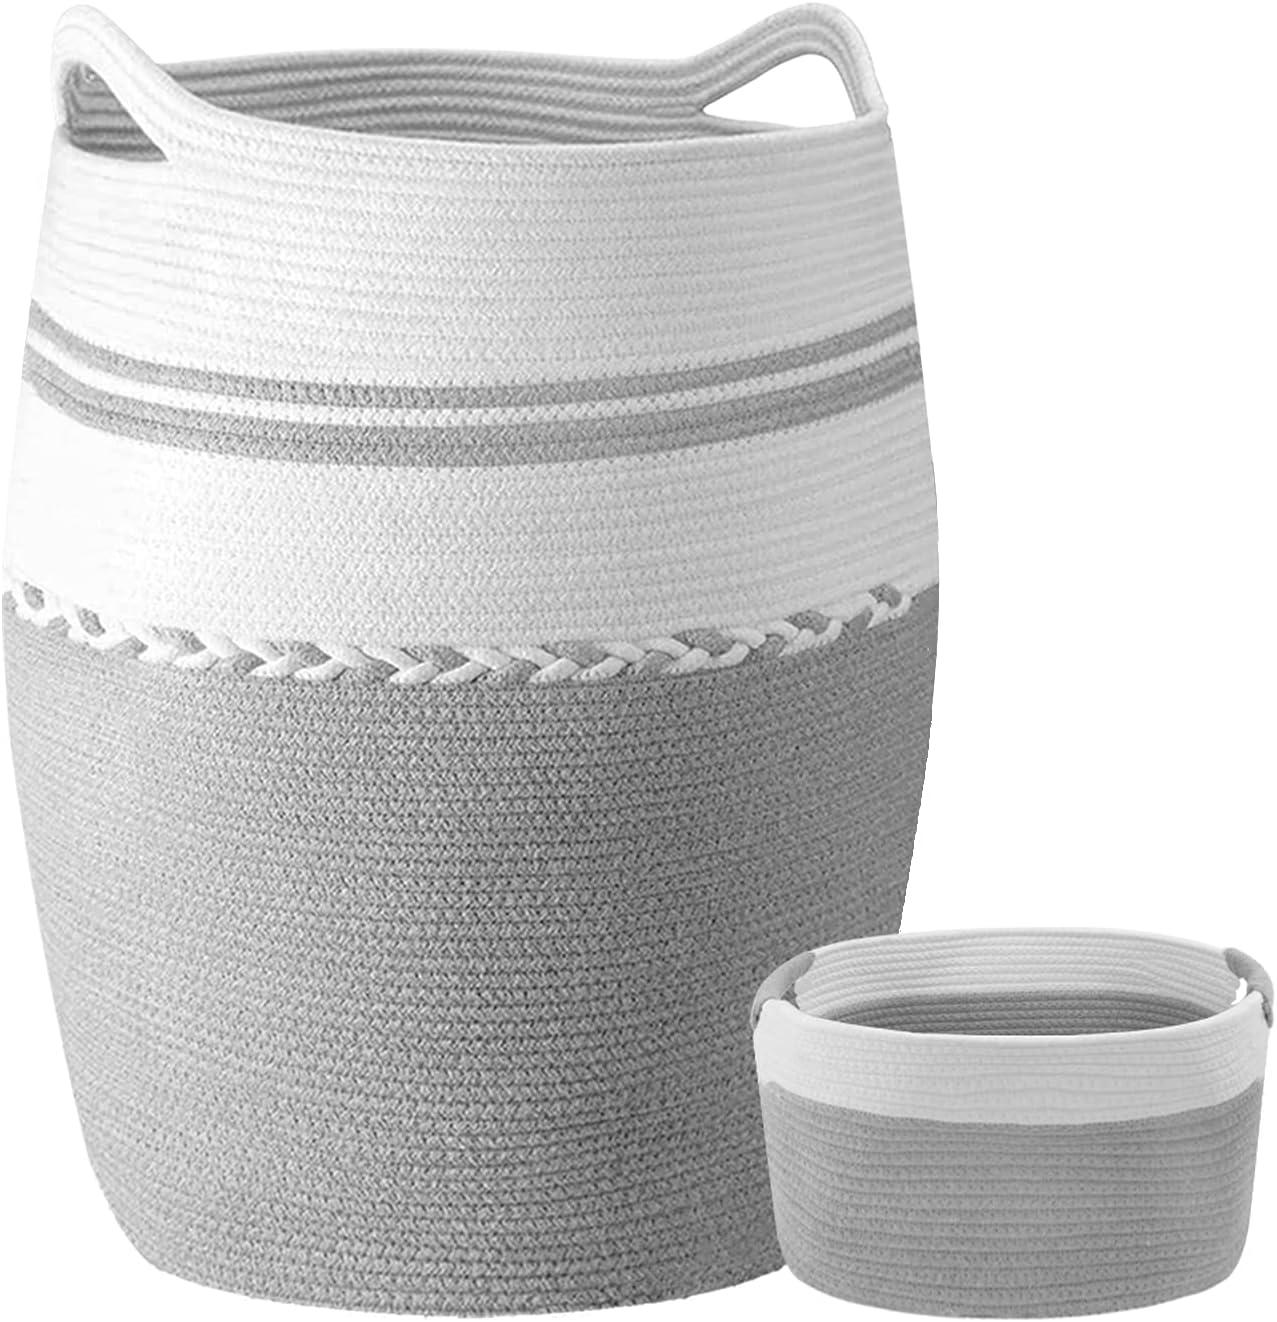 95L+17L Woven Laundry Hamper with Storage 25% OFF Lowest price challenge 2PCs Basket Handles